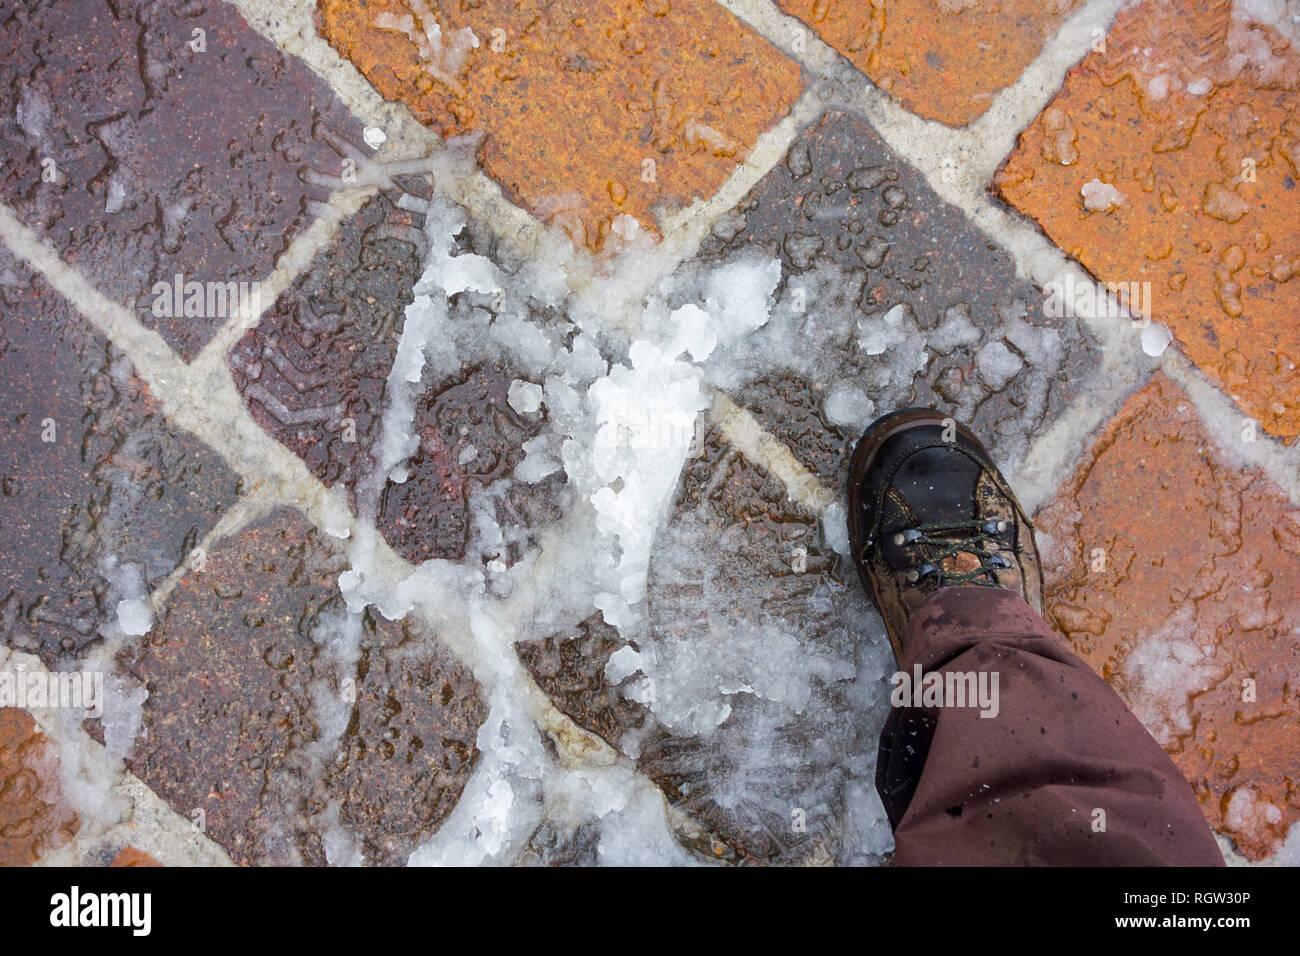 Shoe on wet snow / sleet on slippery pavement / sidewalk in winter - Stock Image